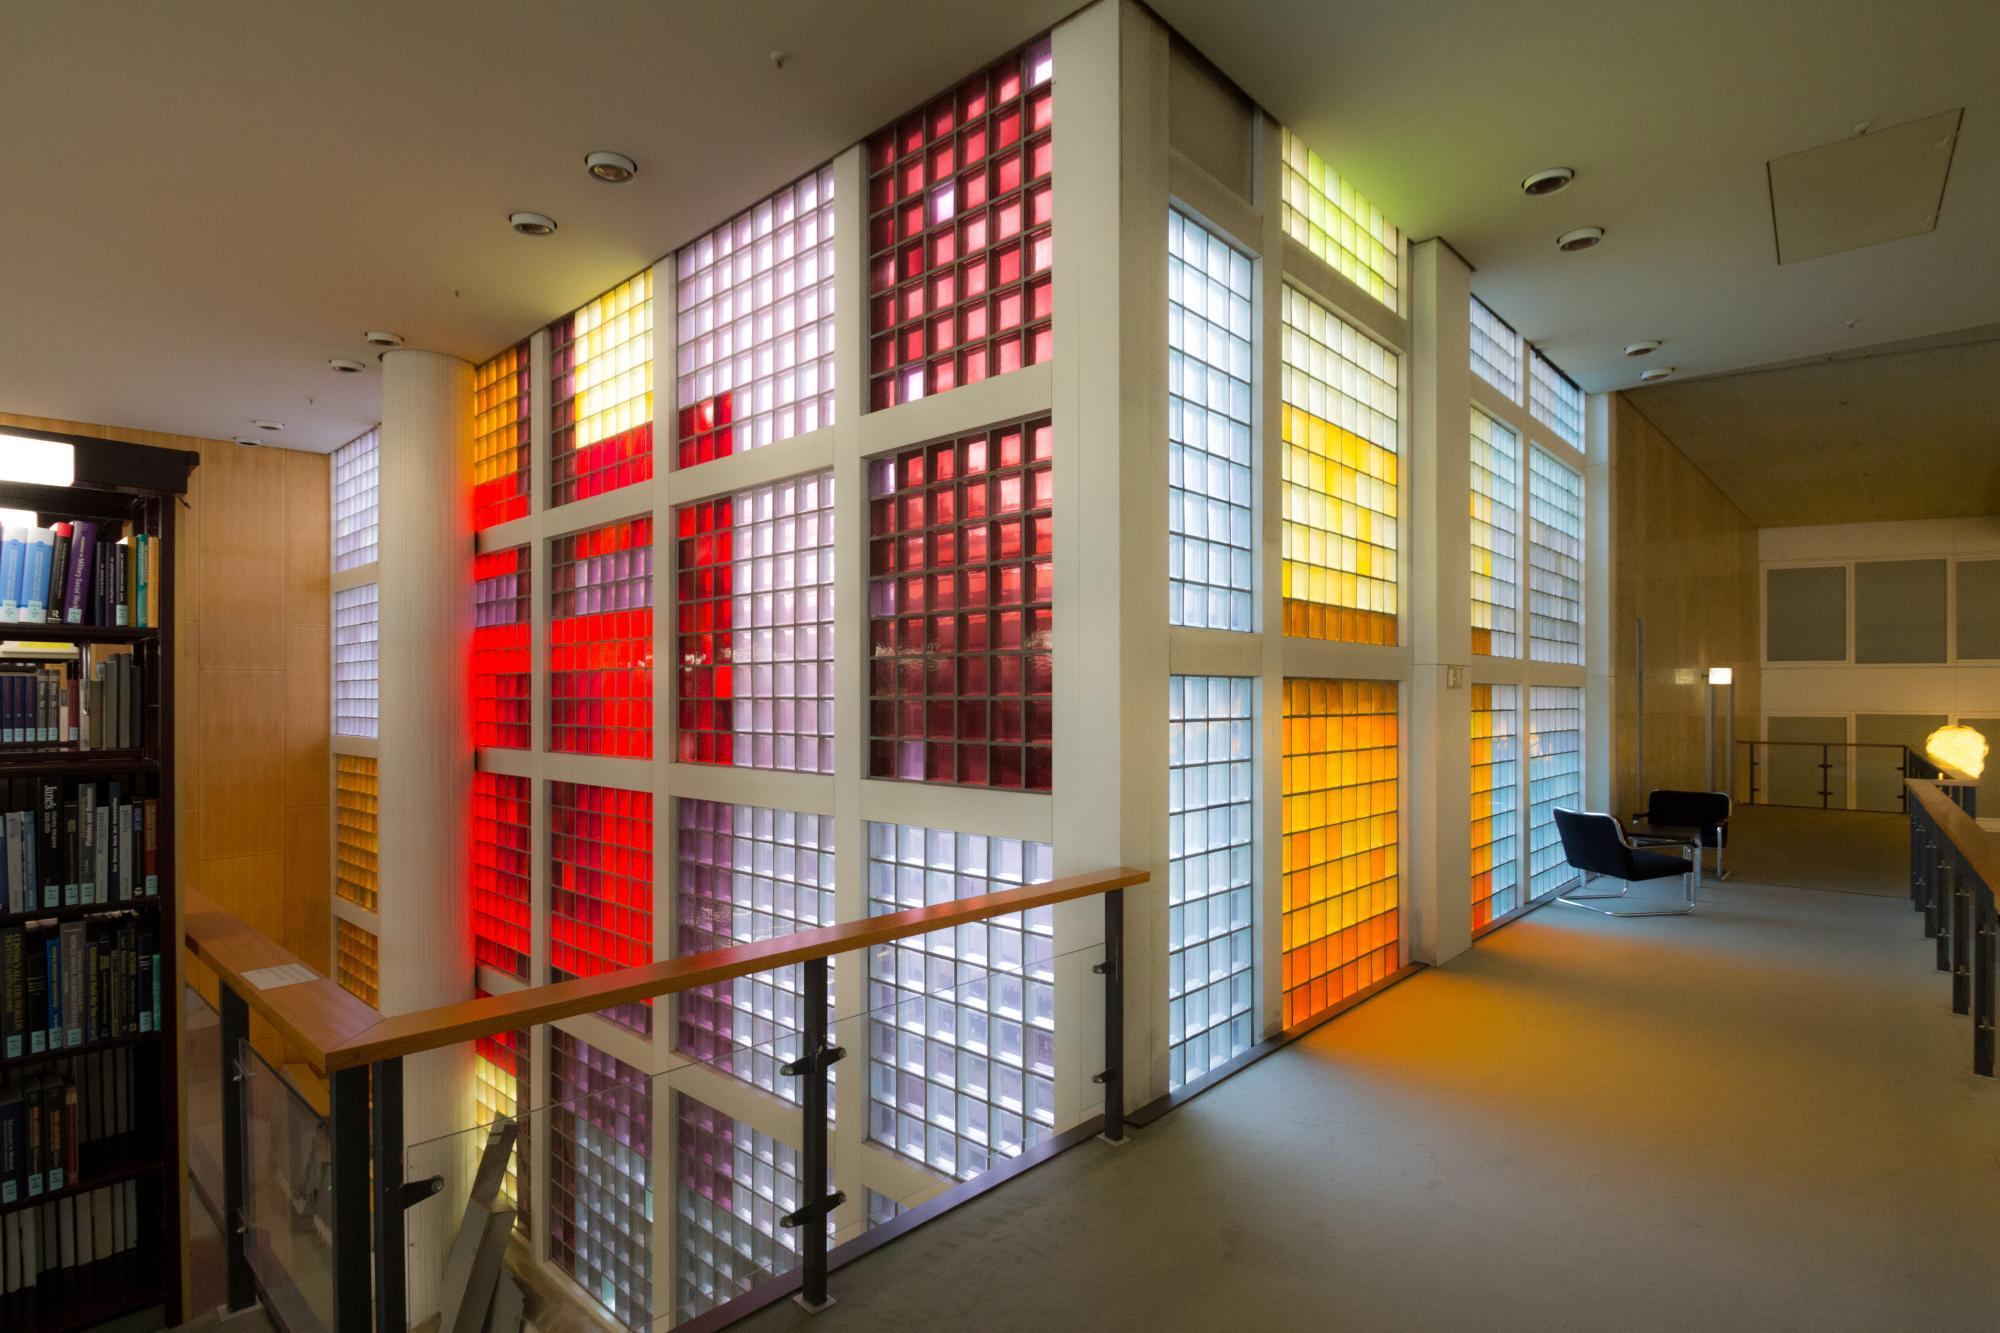 Glasbausteinfenster im lesesaal staatsbibliothek zu for Rechtswissenschaften nc